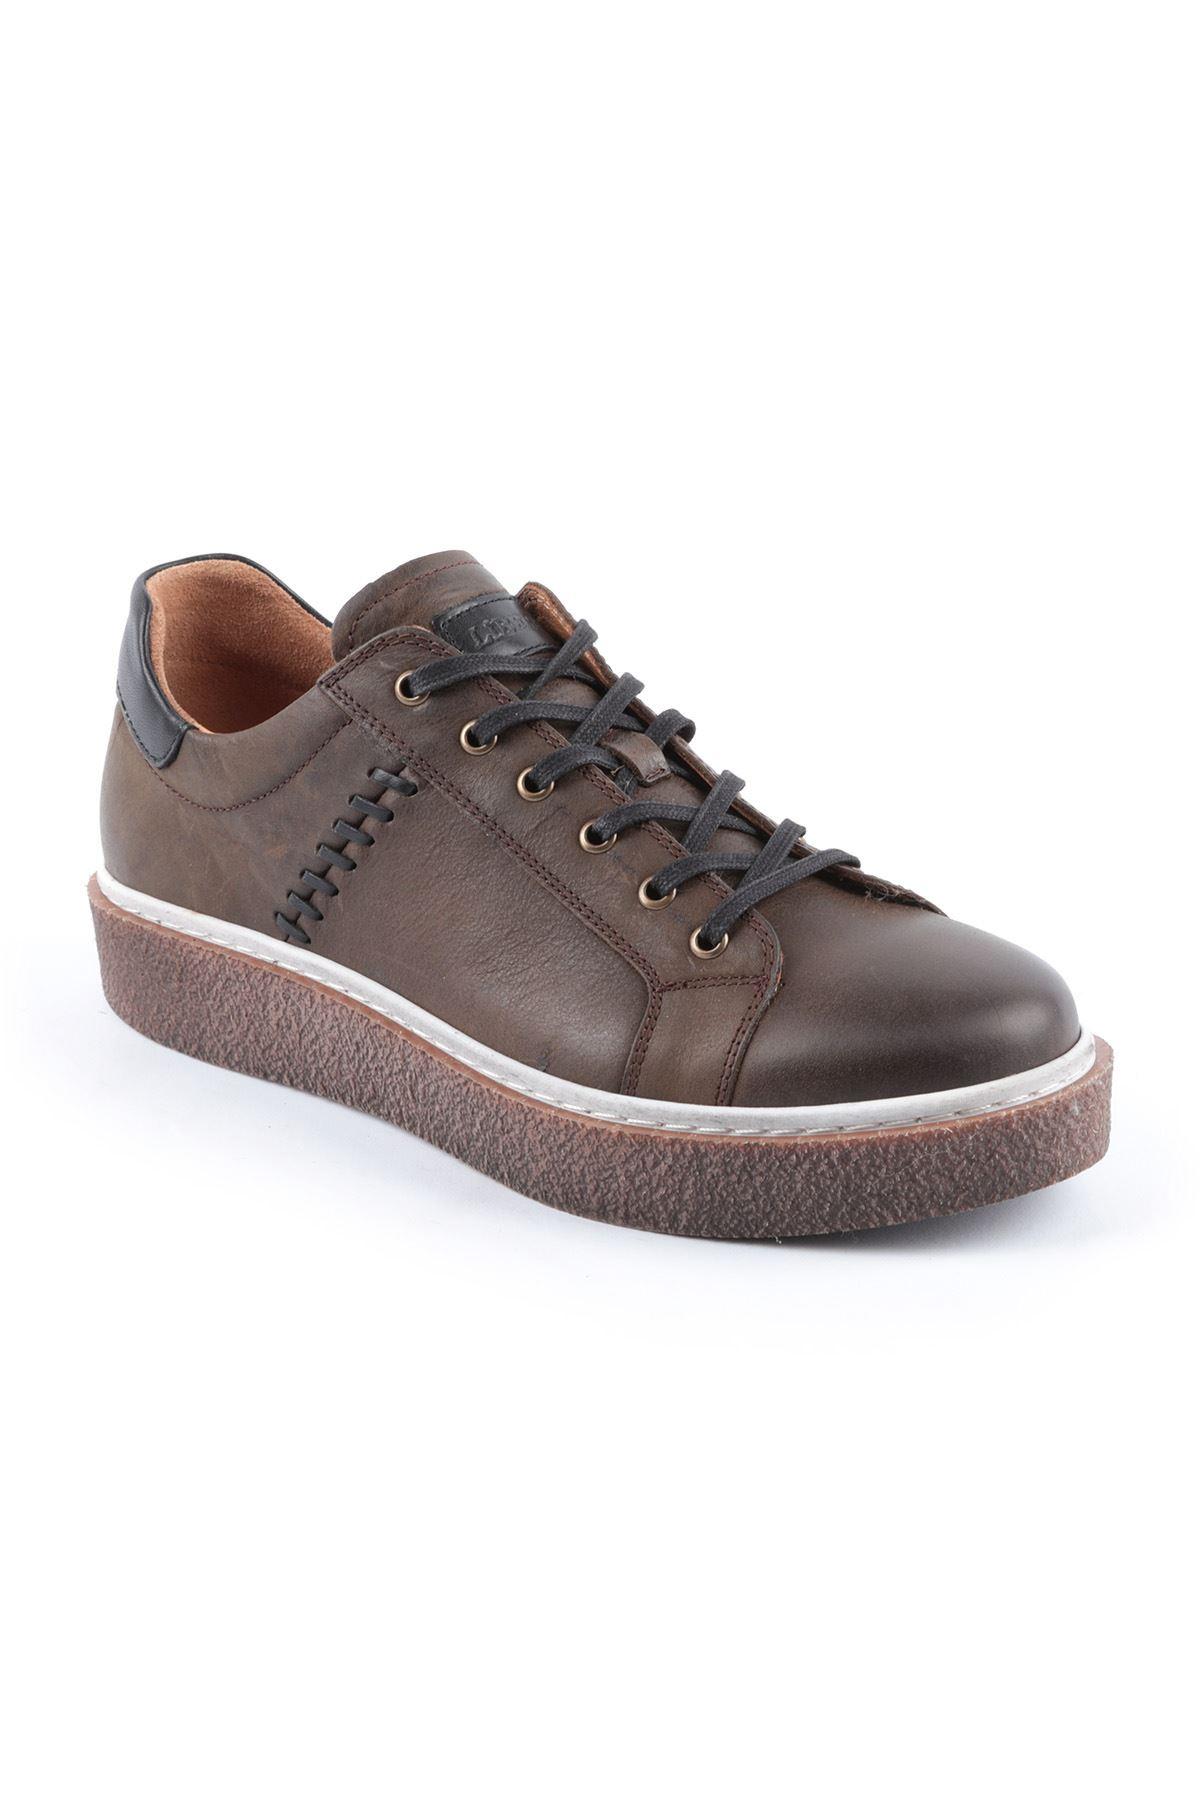 Libero L2613 EA Haki Casual Ayakkabı